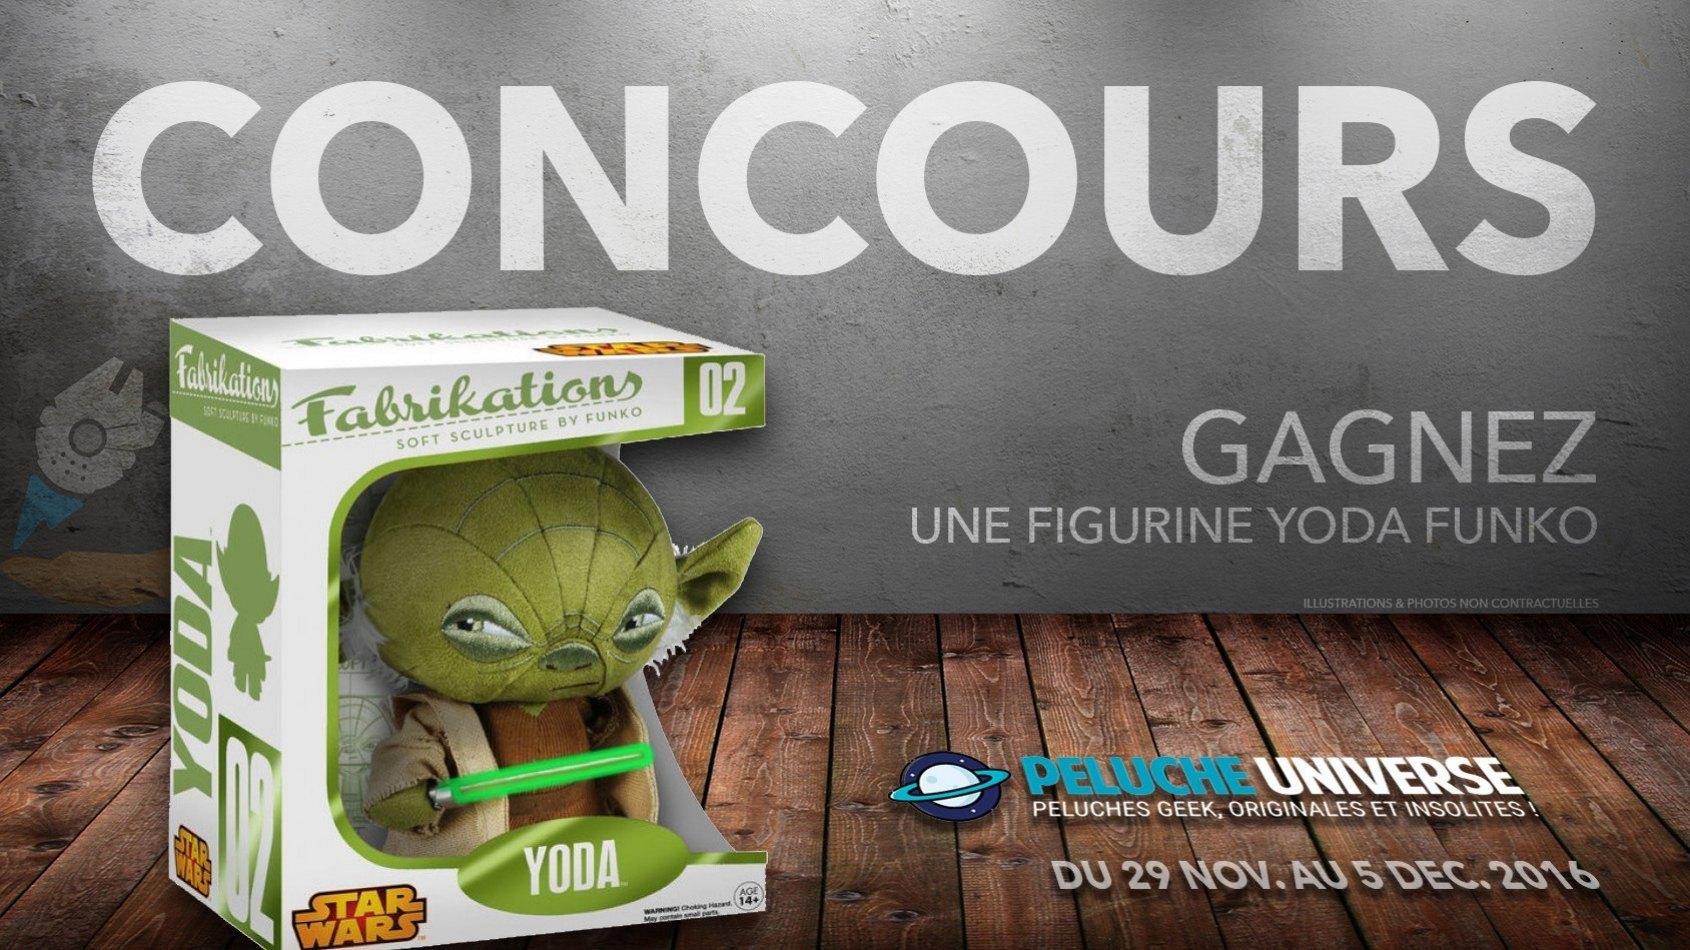 CONCOURS - Gagnez une figurine Yoda Funko avec Peluche Universe